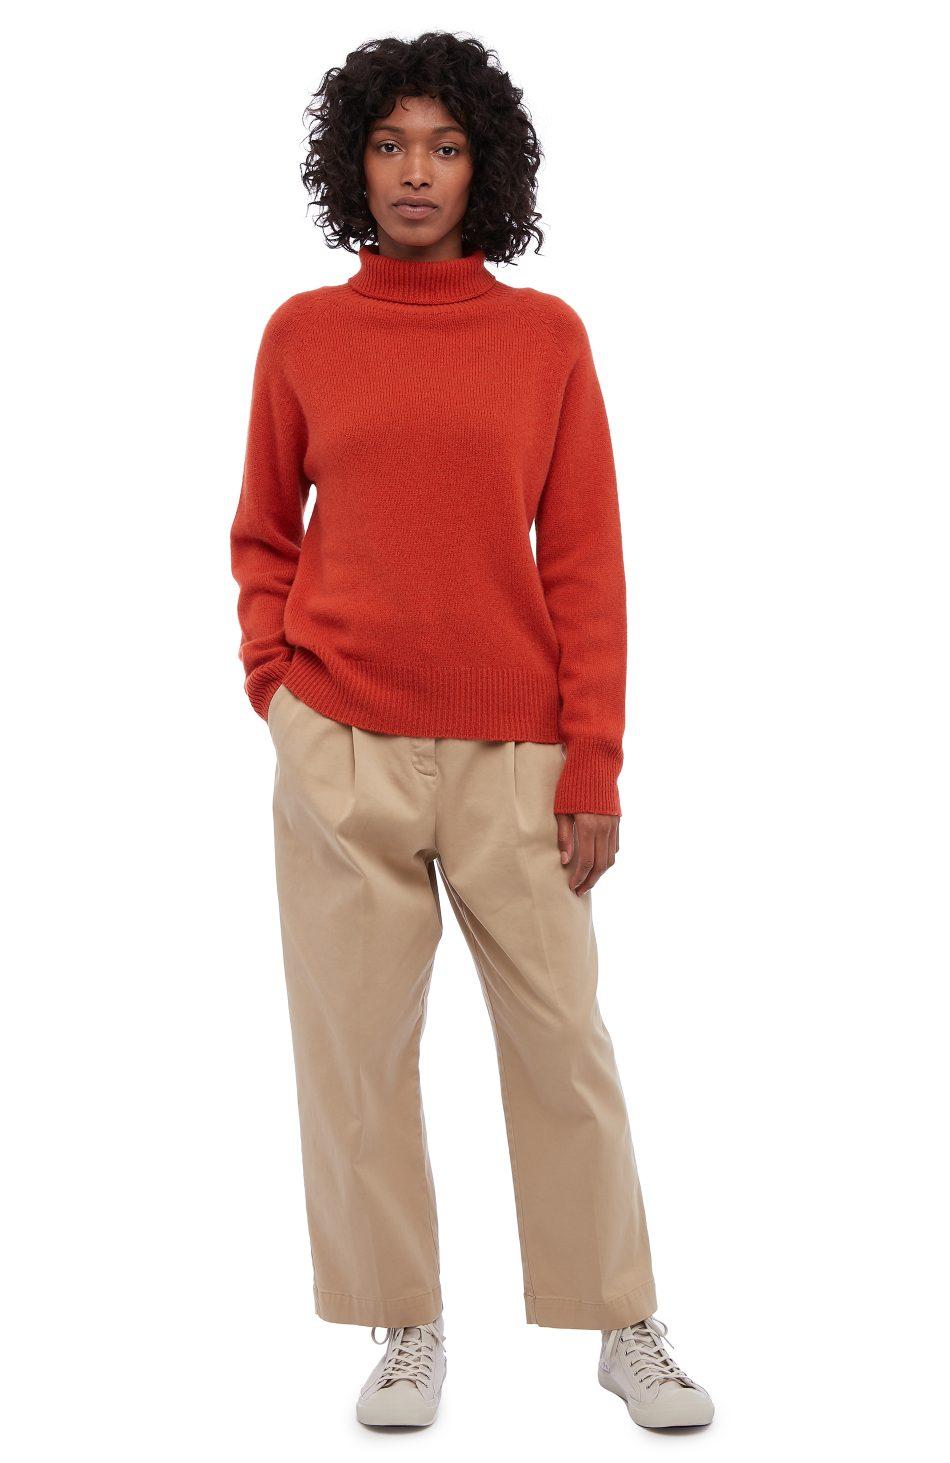 8c11afe50b4a9c Cottage Cashmere Roll Neck (orange) - You Must Create (YMC)